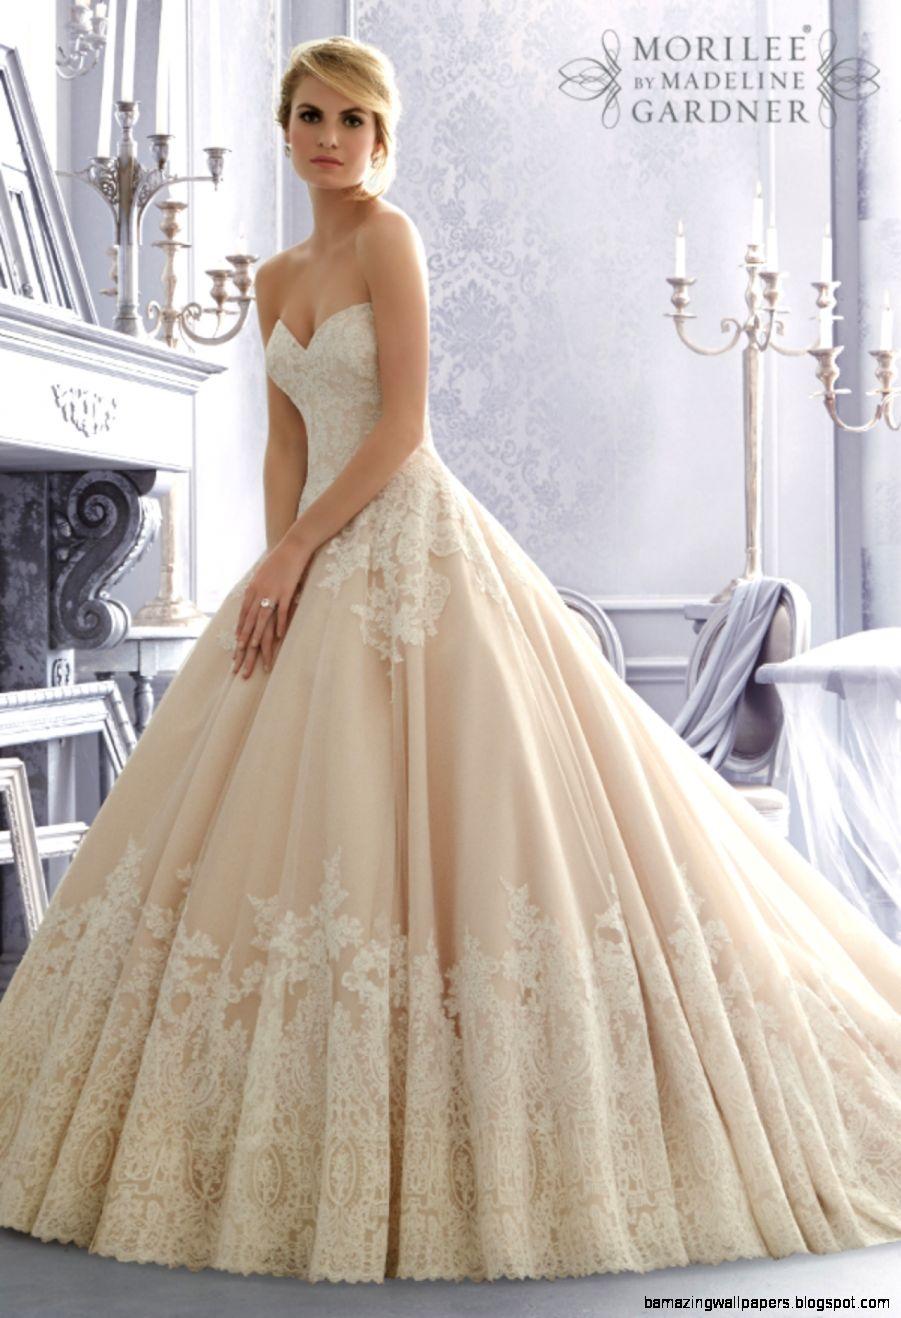 Top 5 Wedding Dresses for a Winter Wonderland Wedding  Fantasy